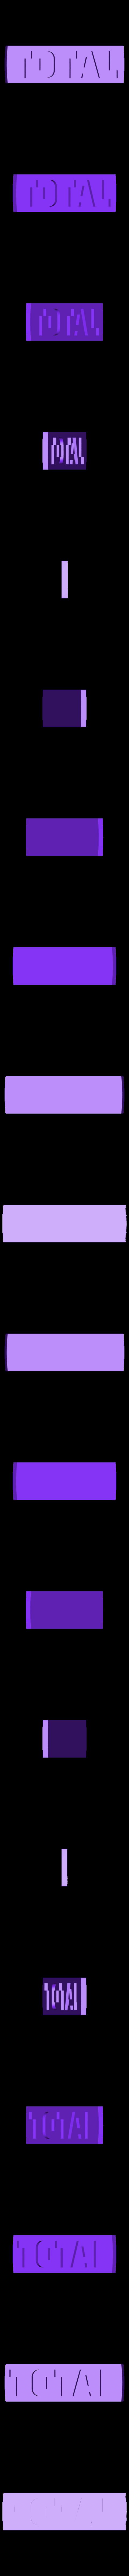 logo_TOTAL_70_support_blanc.STL Download free STL file TOTAL logo 1970 • Template to 3D print, lulu3Dbuilder